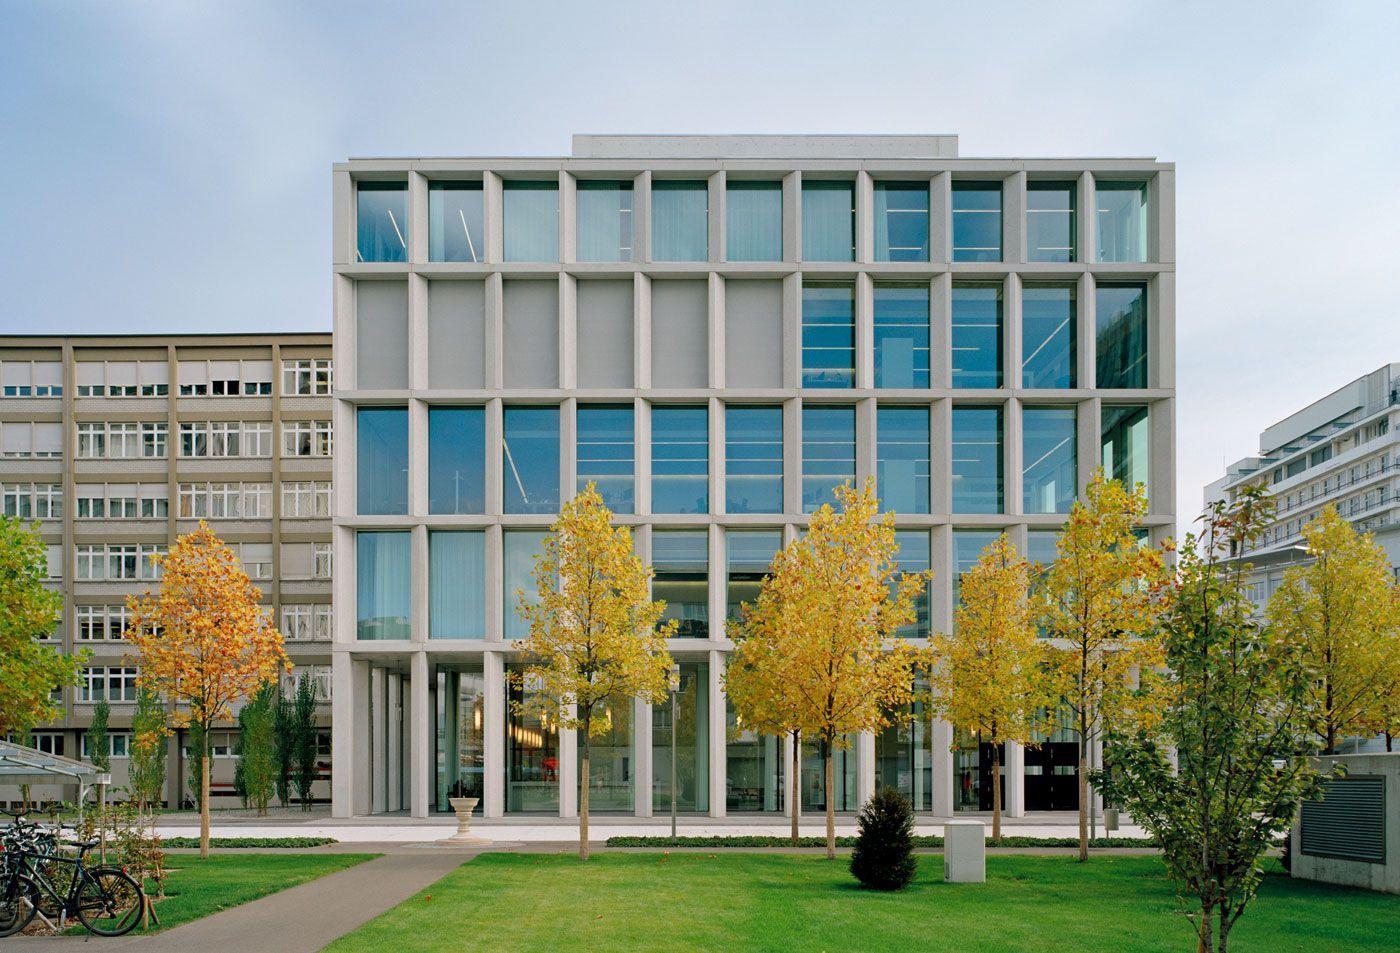 david chipperfield buildings - photo #8